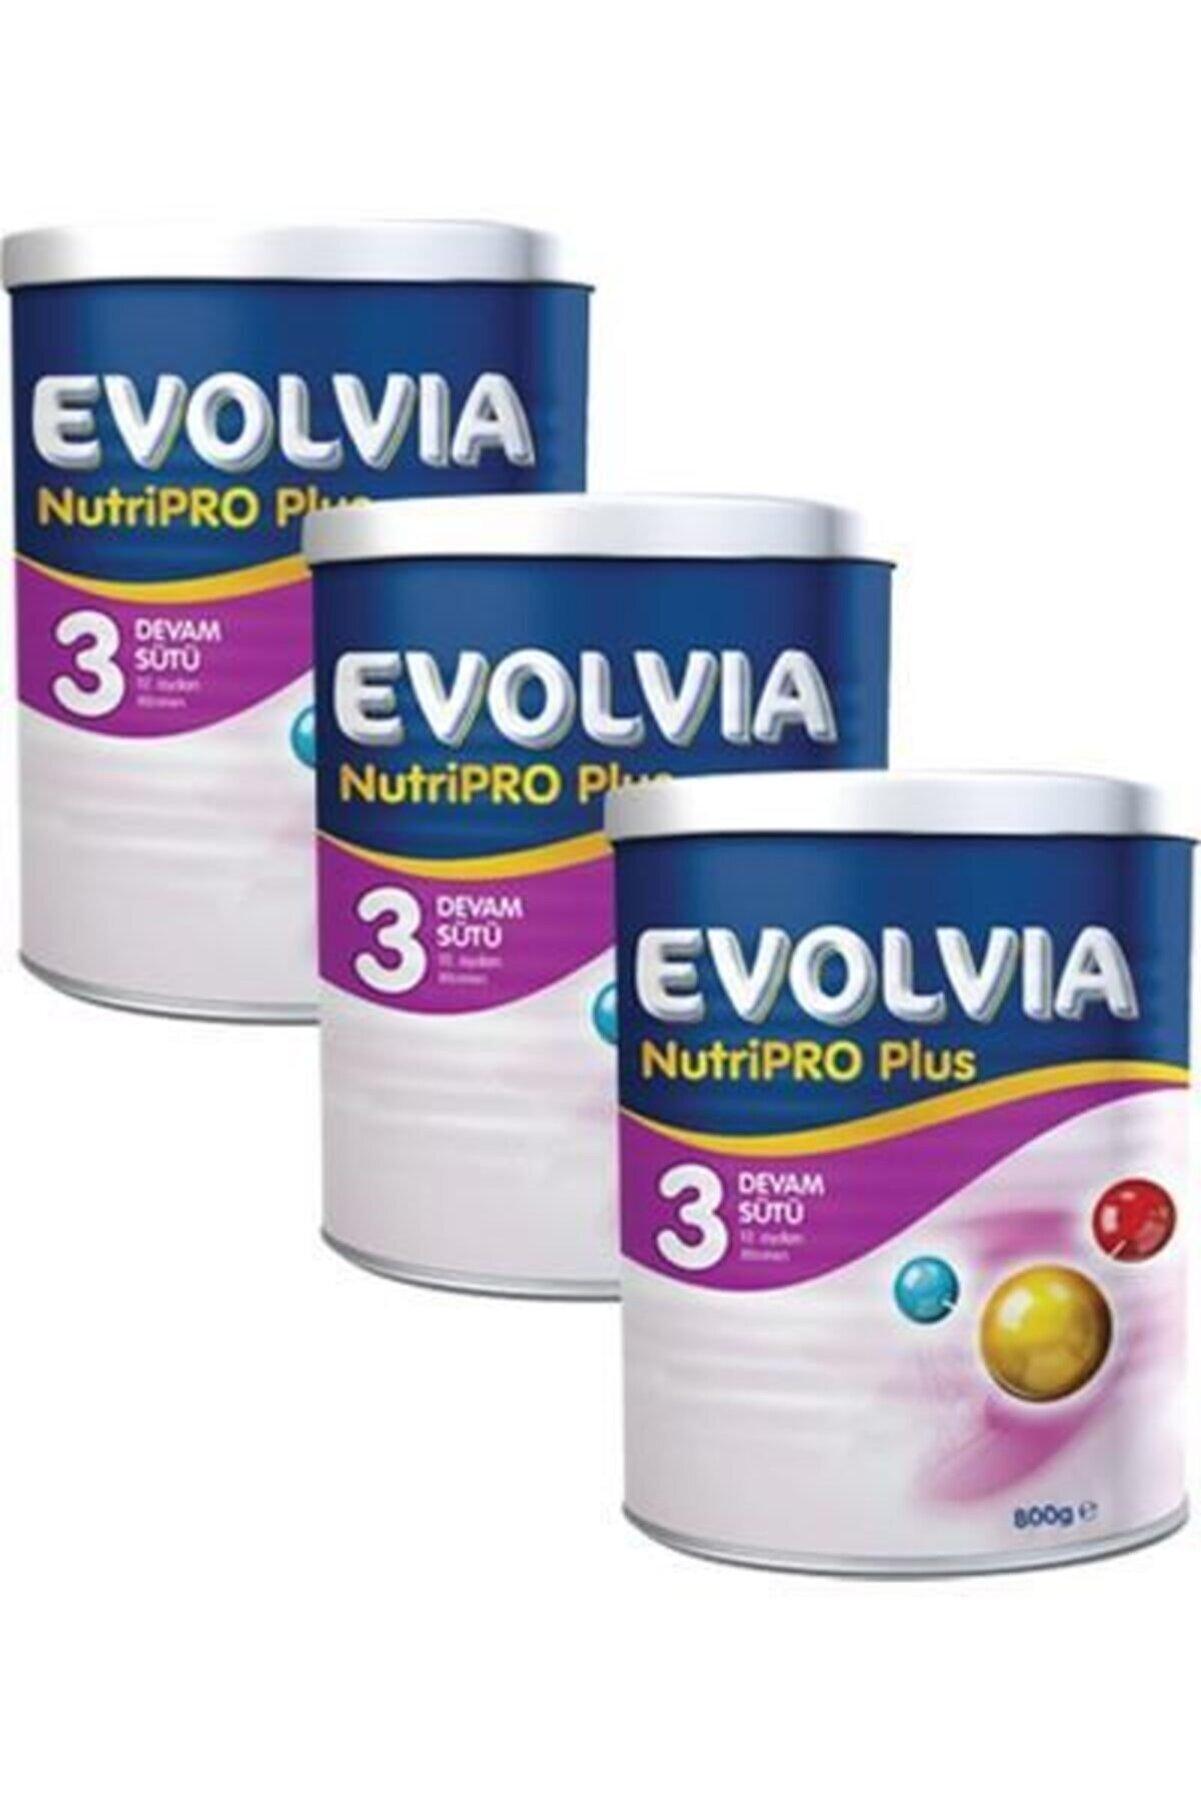 Evolvia Nutripro Plus 3 Bebek Maması 800 gr X 3 adet